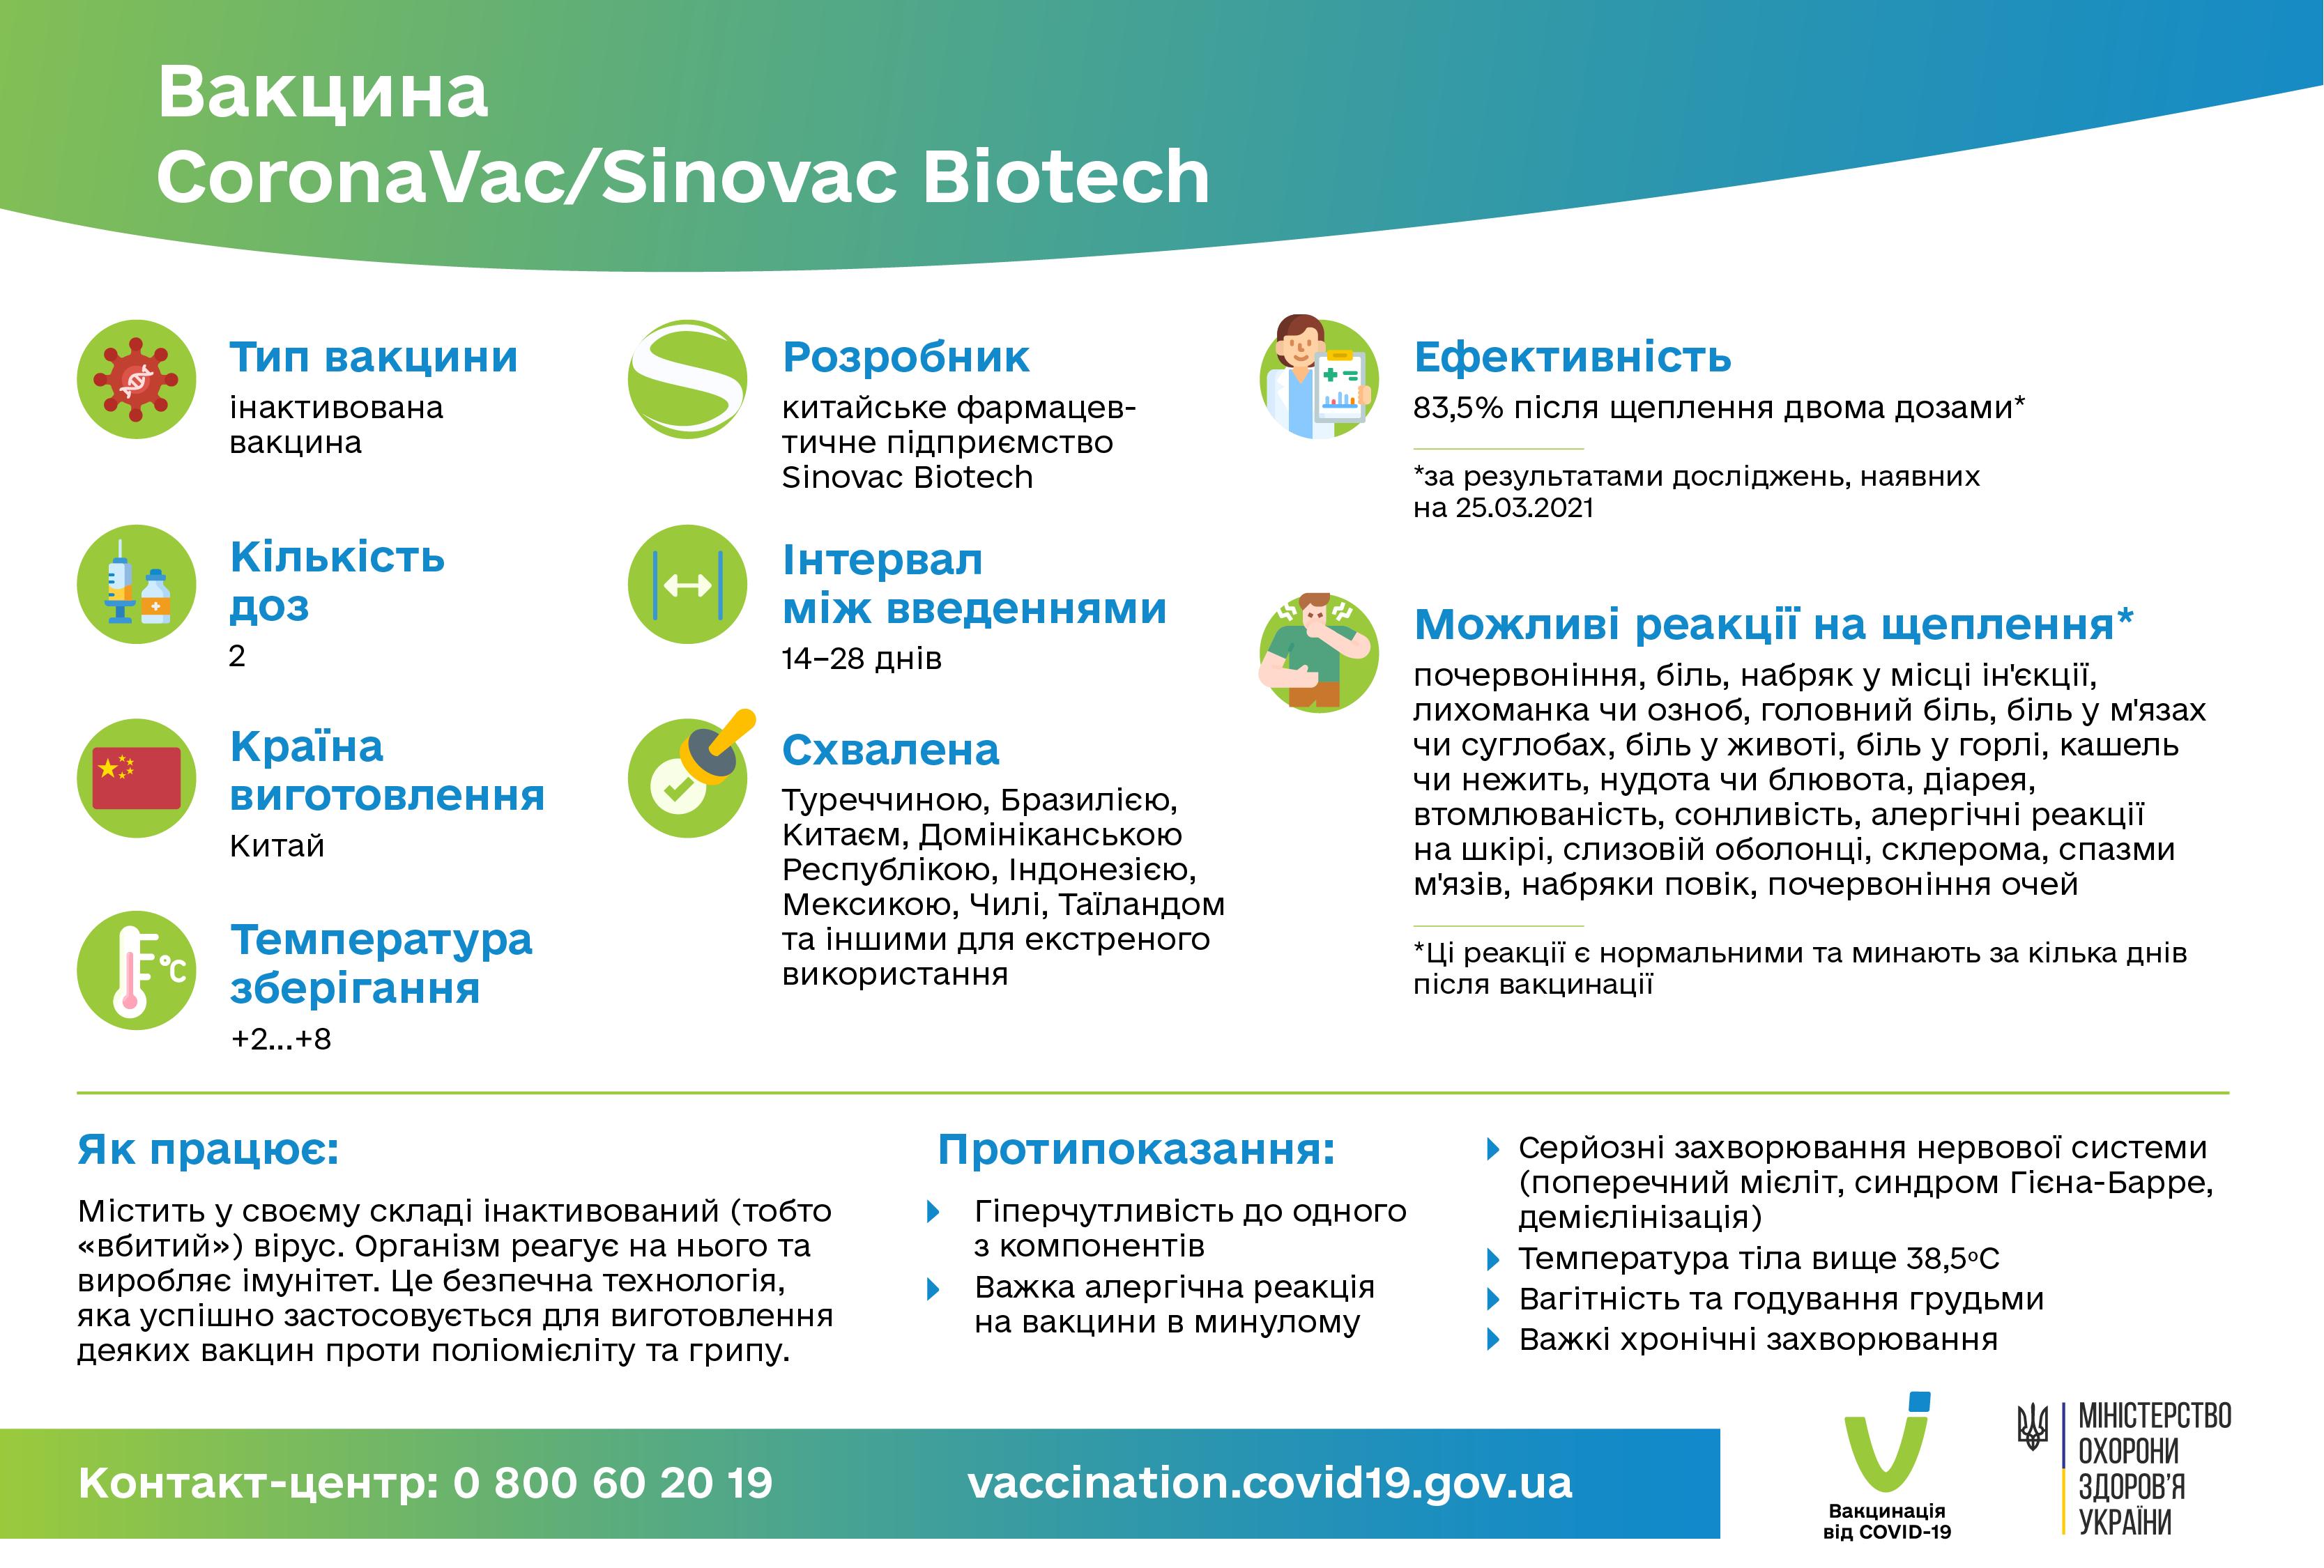 CoronaVac-Sinovac Biotech